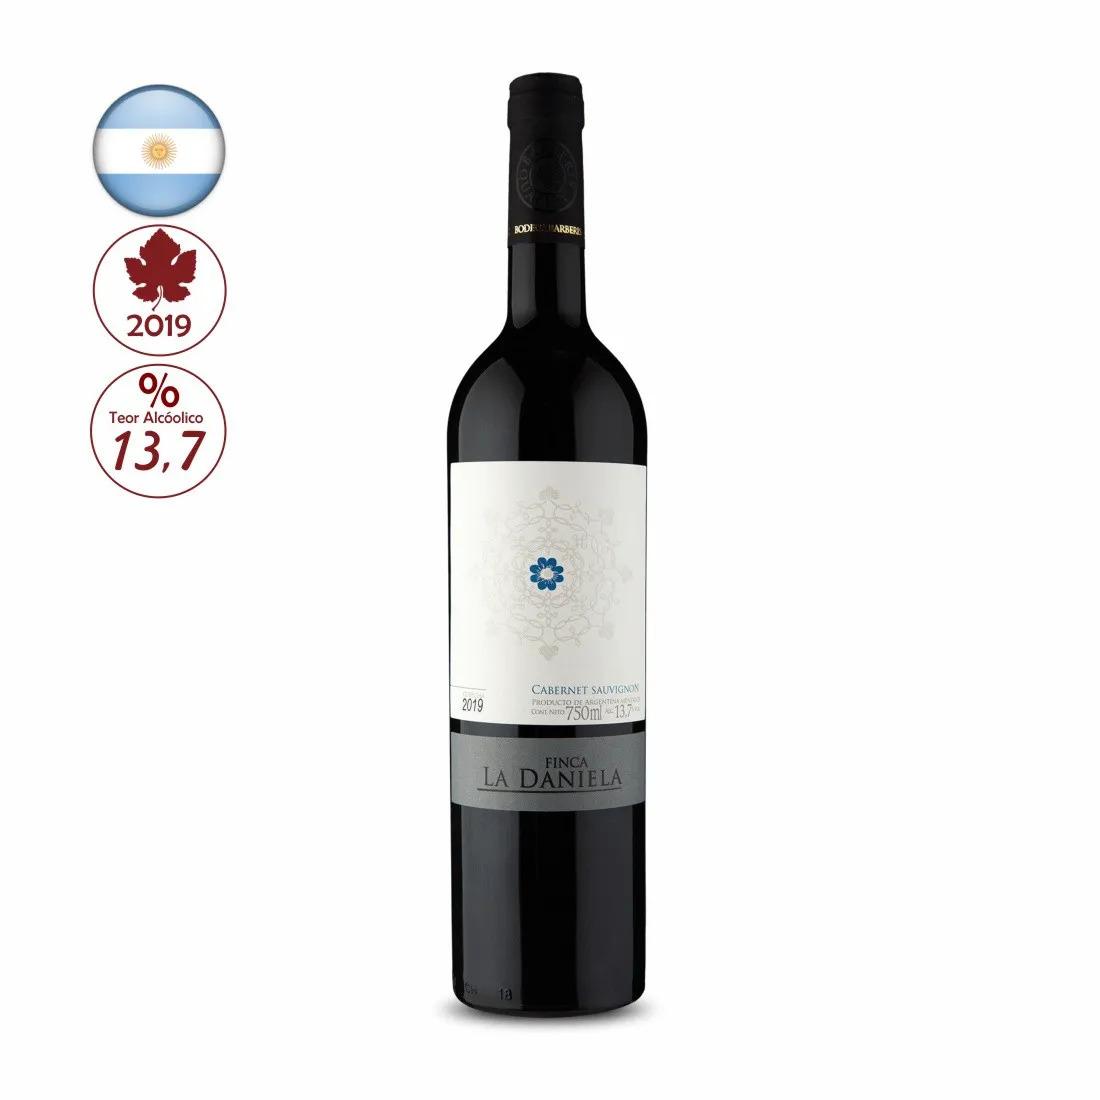 Vinho Tinto Argentino Finca La Daniela Cabernet Sauvignon 2019